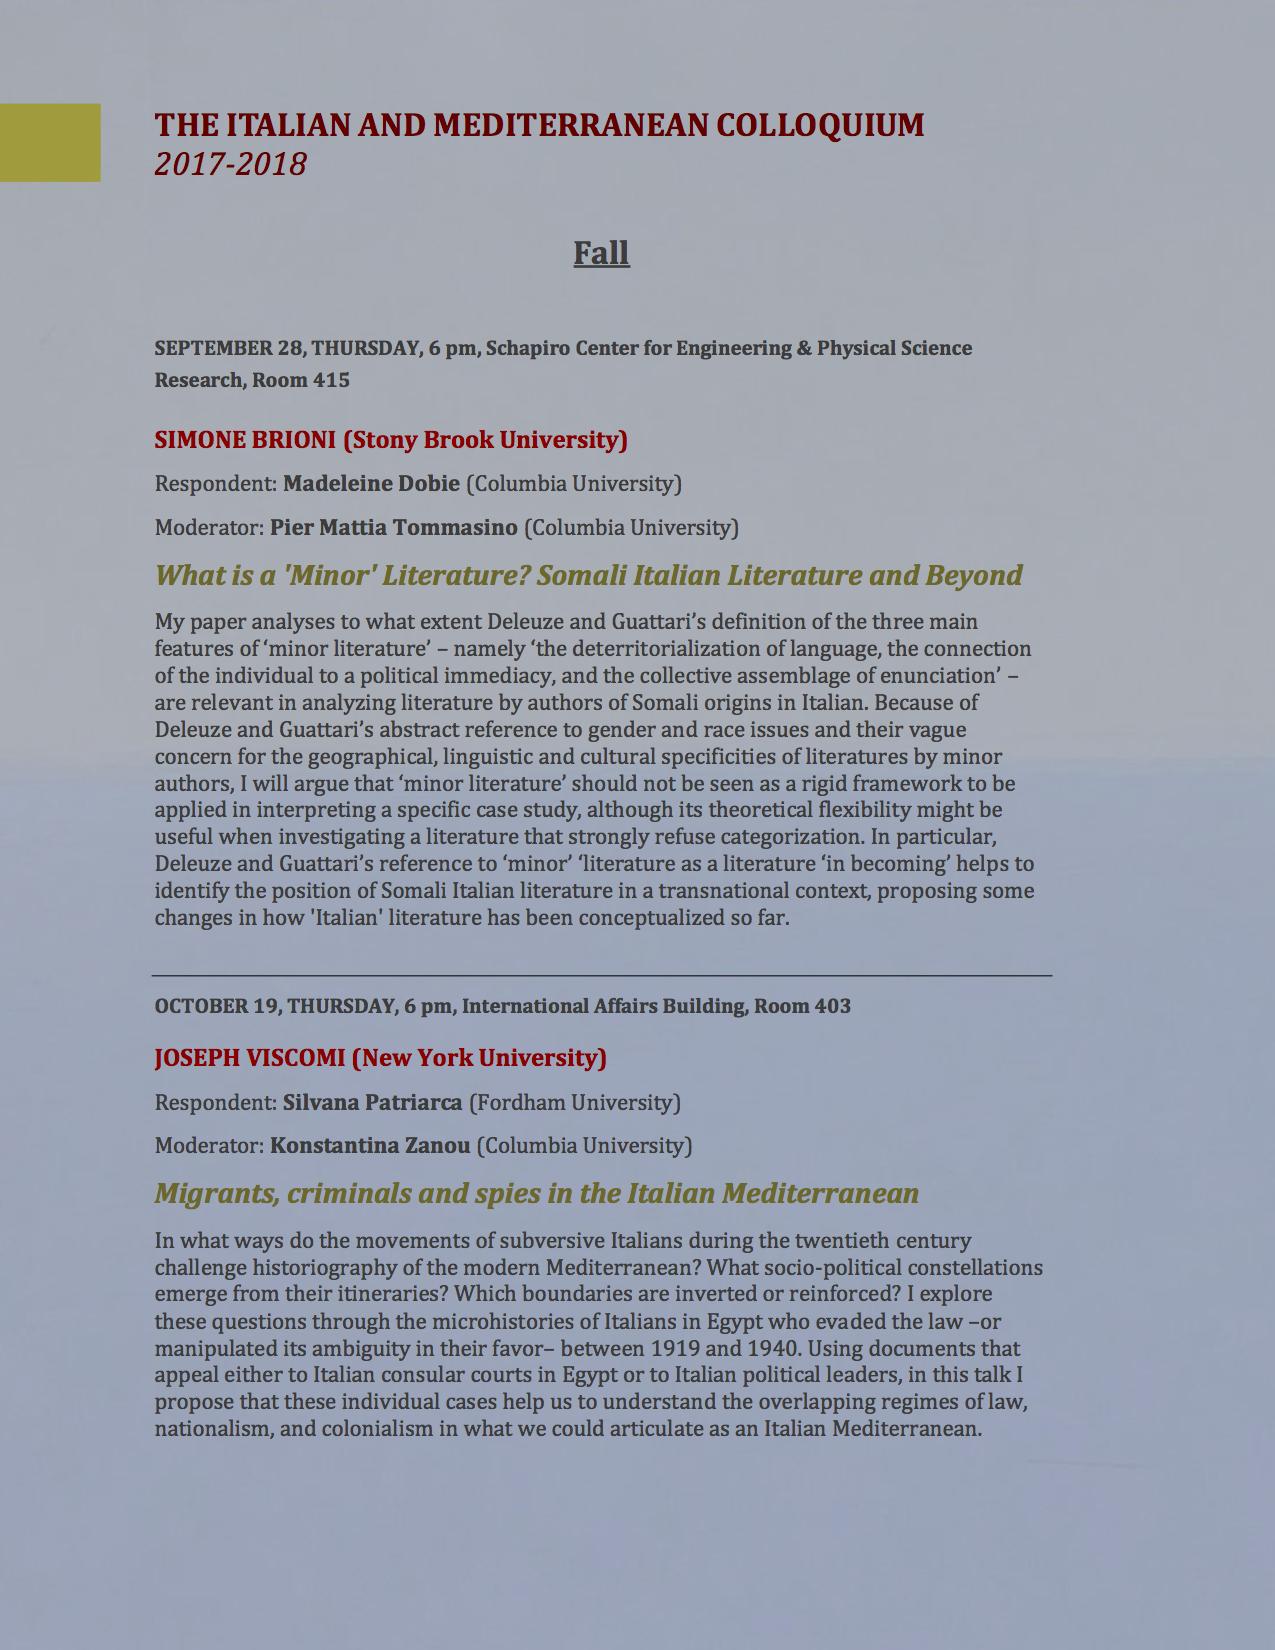 The_Italian_Mediterranean_Colloquium_Fall_2017_Program.png